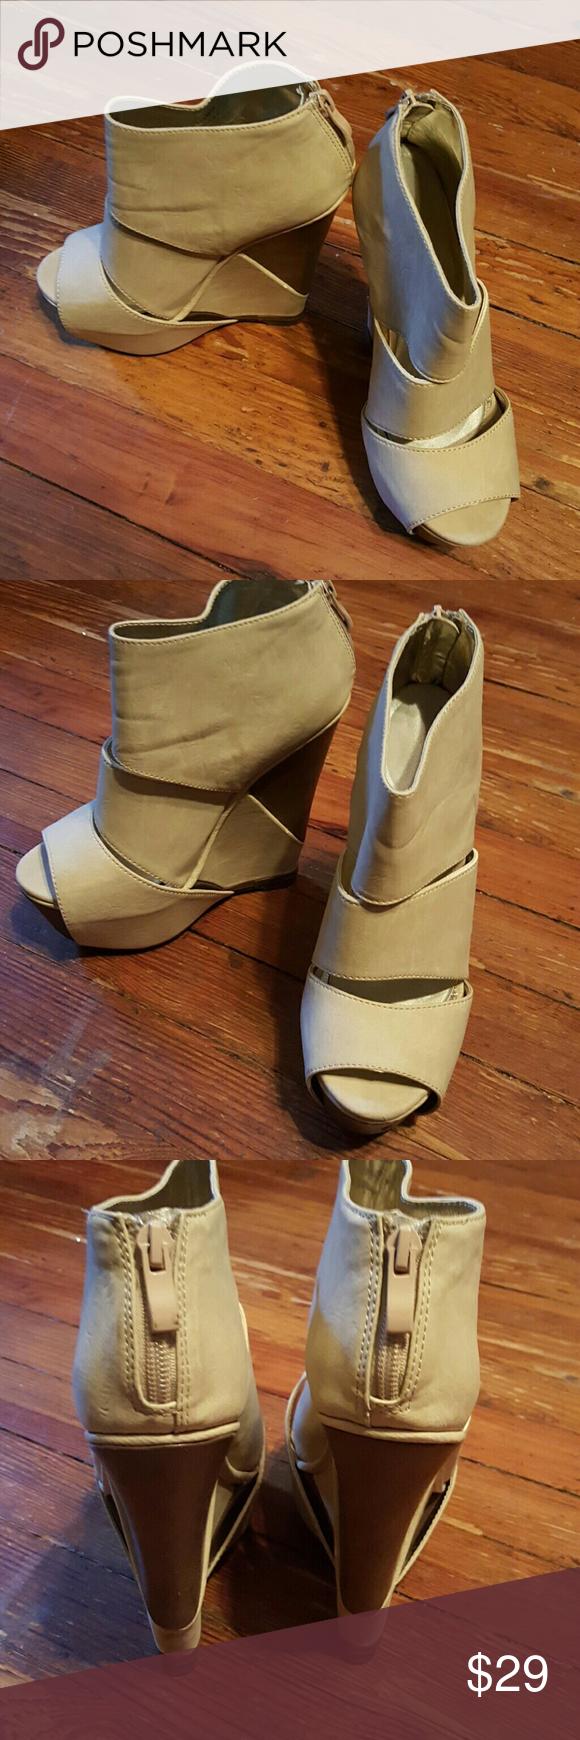 """Vianca"" Platform Wedge Beige platform wedge from ShoeDazzle Shoe Dazzle Shoes Wedges"